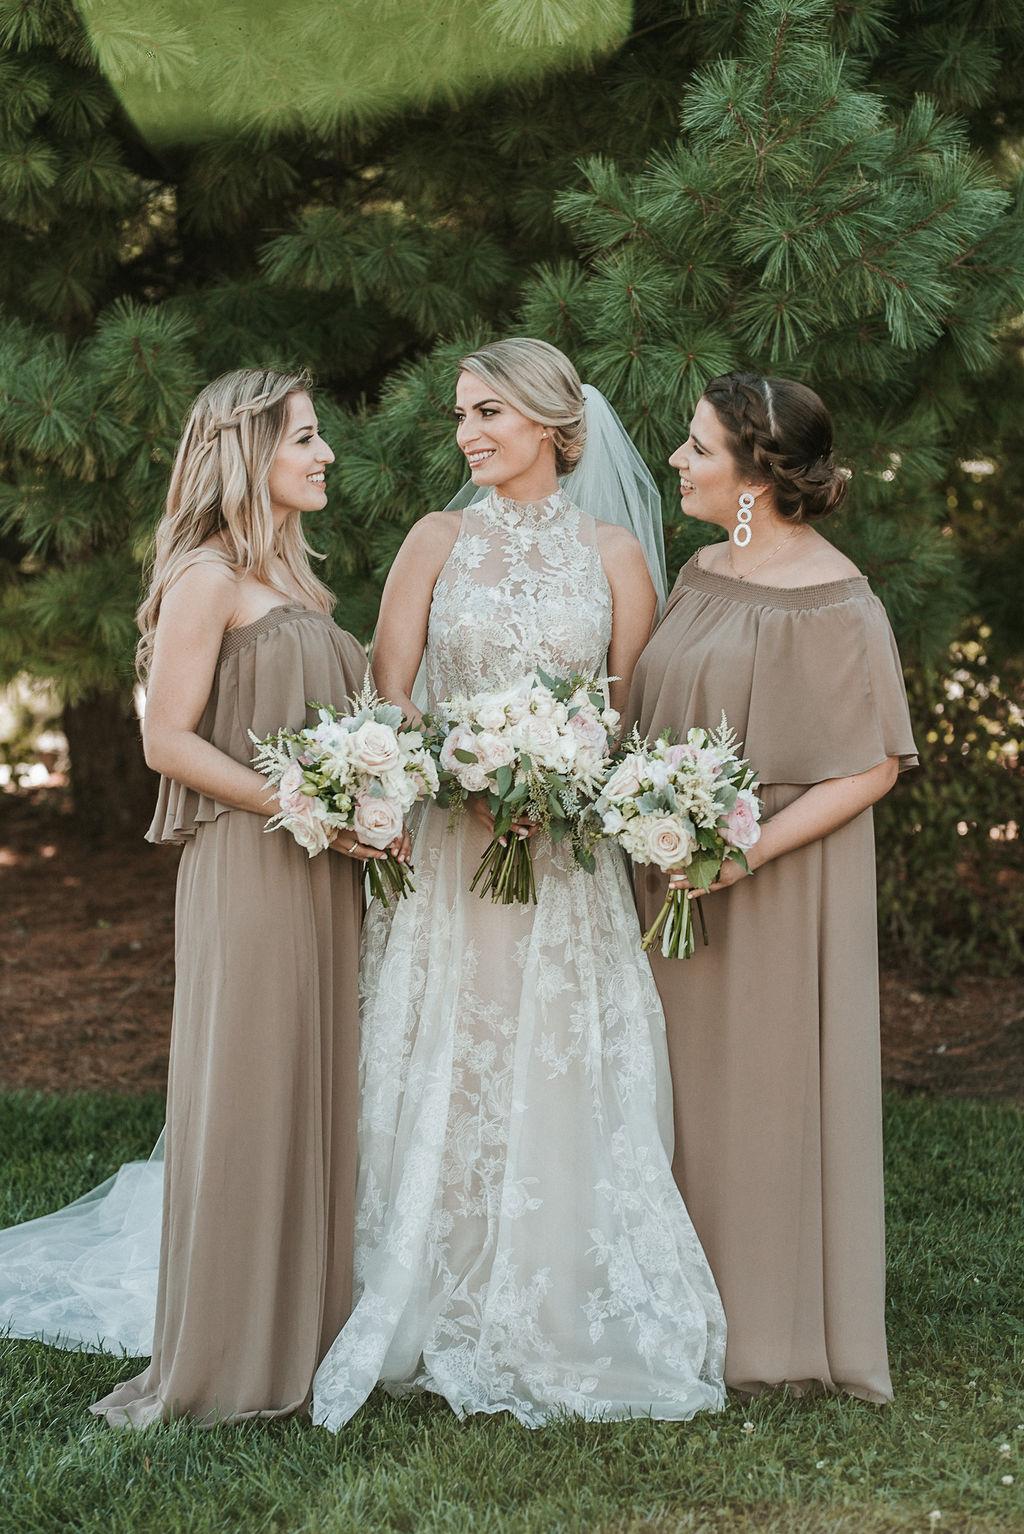 Bride Posing with Bridesmaids at Bluemont Vineyard